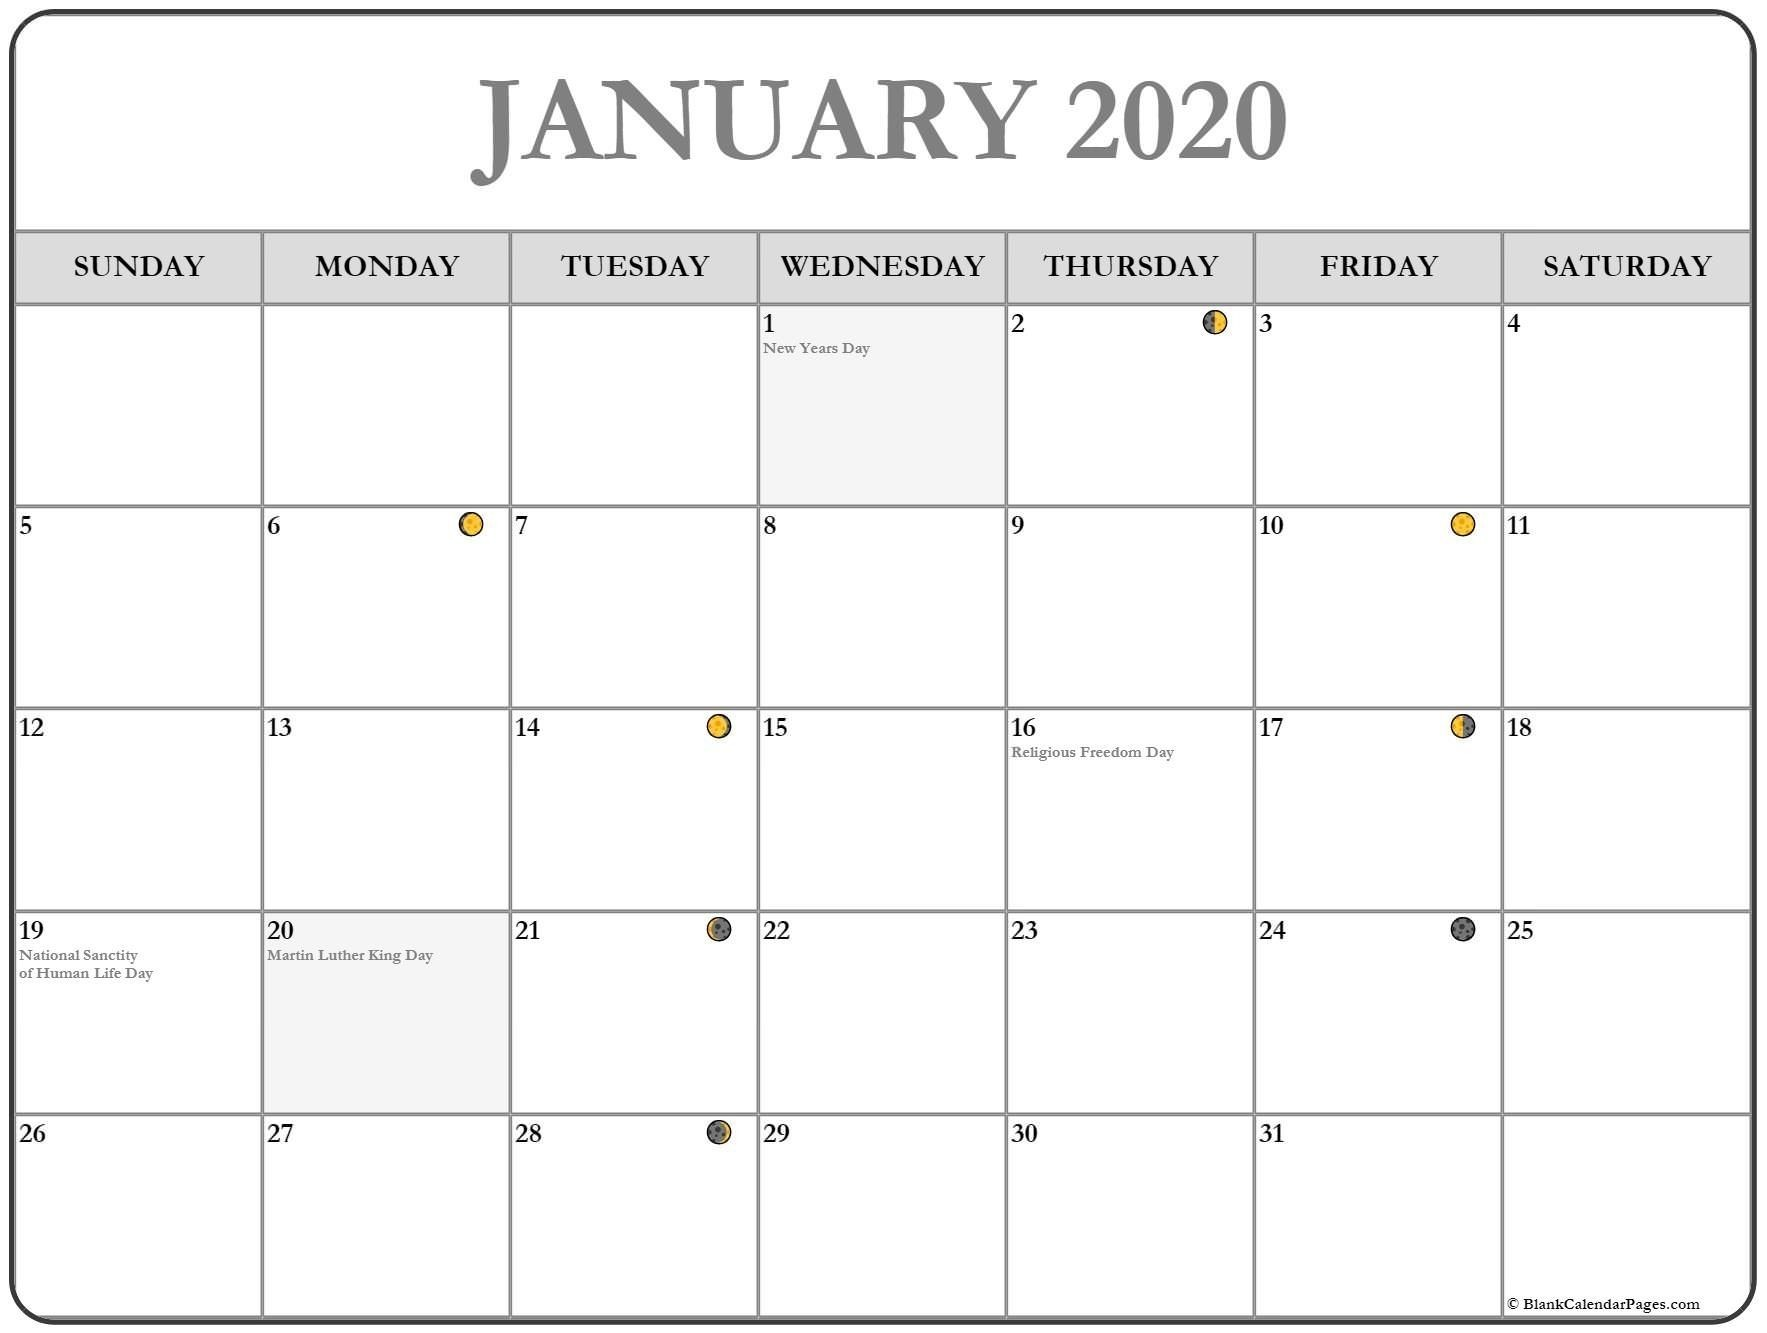 January 2020 Moon Calendar Template